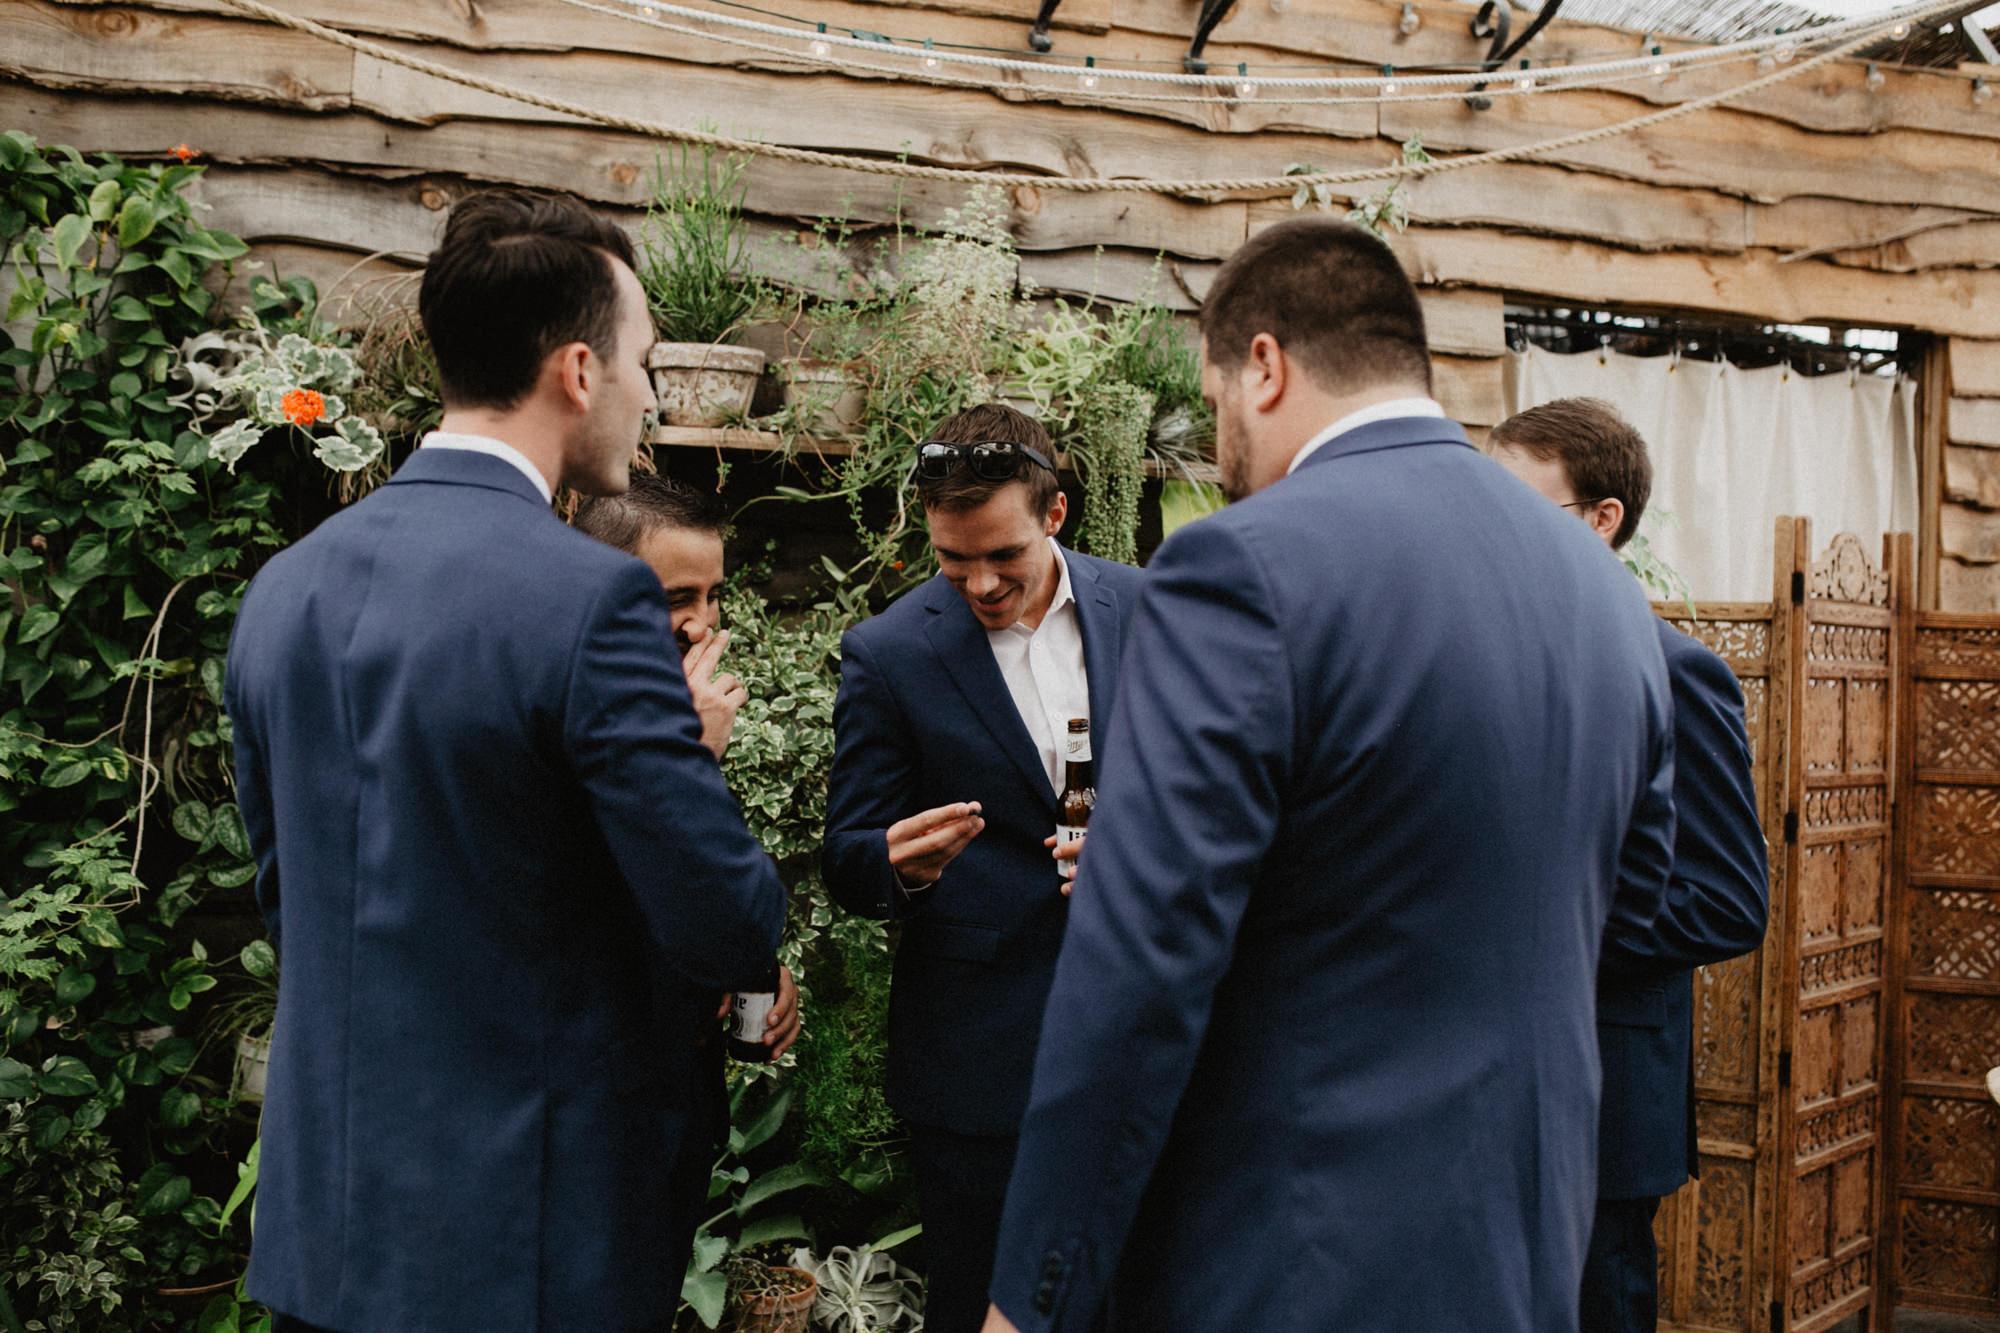 terrain-events-wedding-photographer-18.jpg